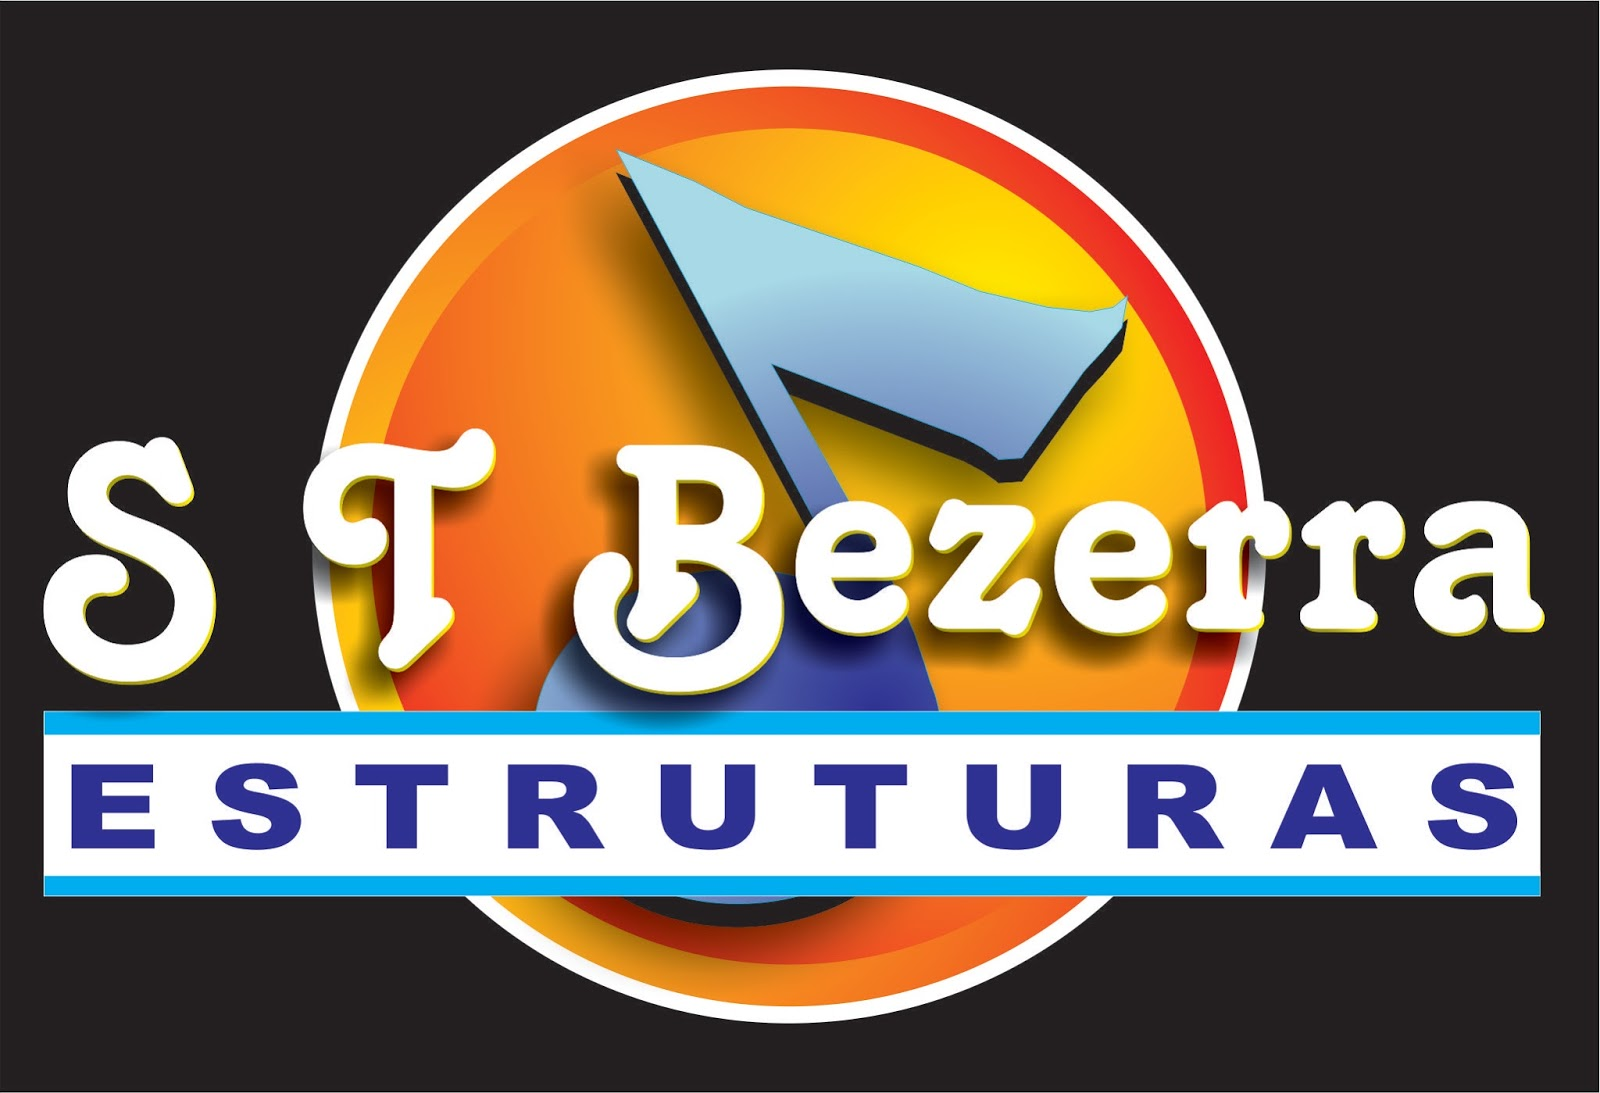 MENSAGEM DA ST BEZERRA ESTRUTURAS